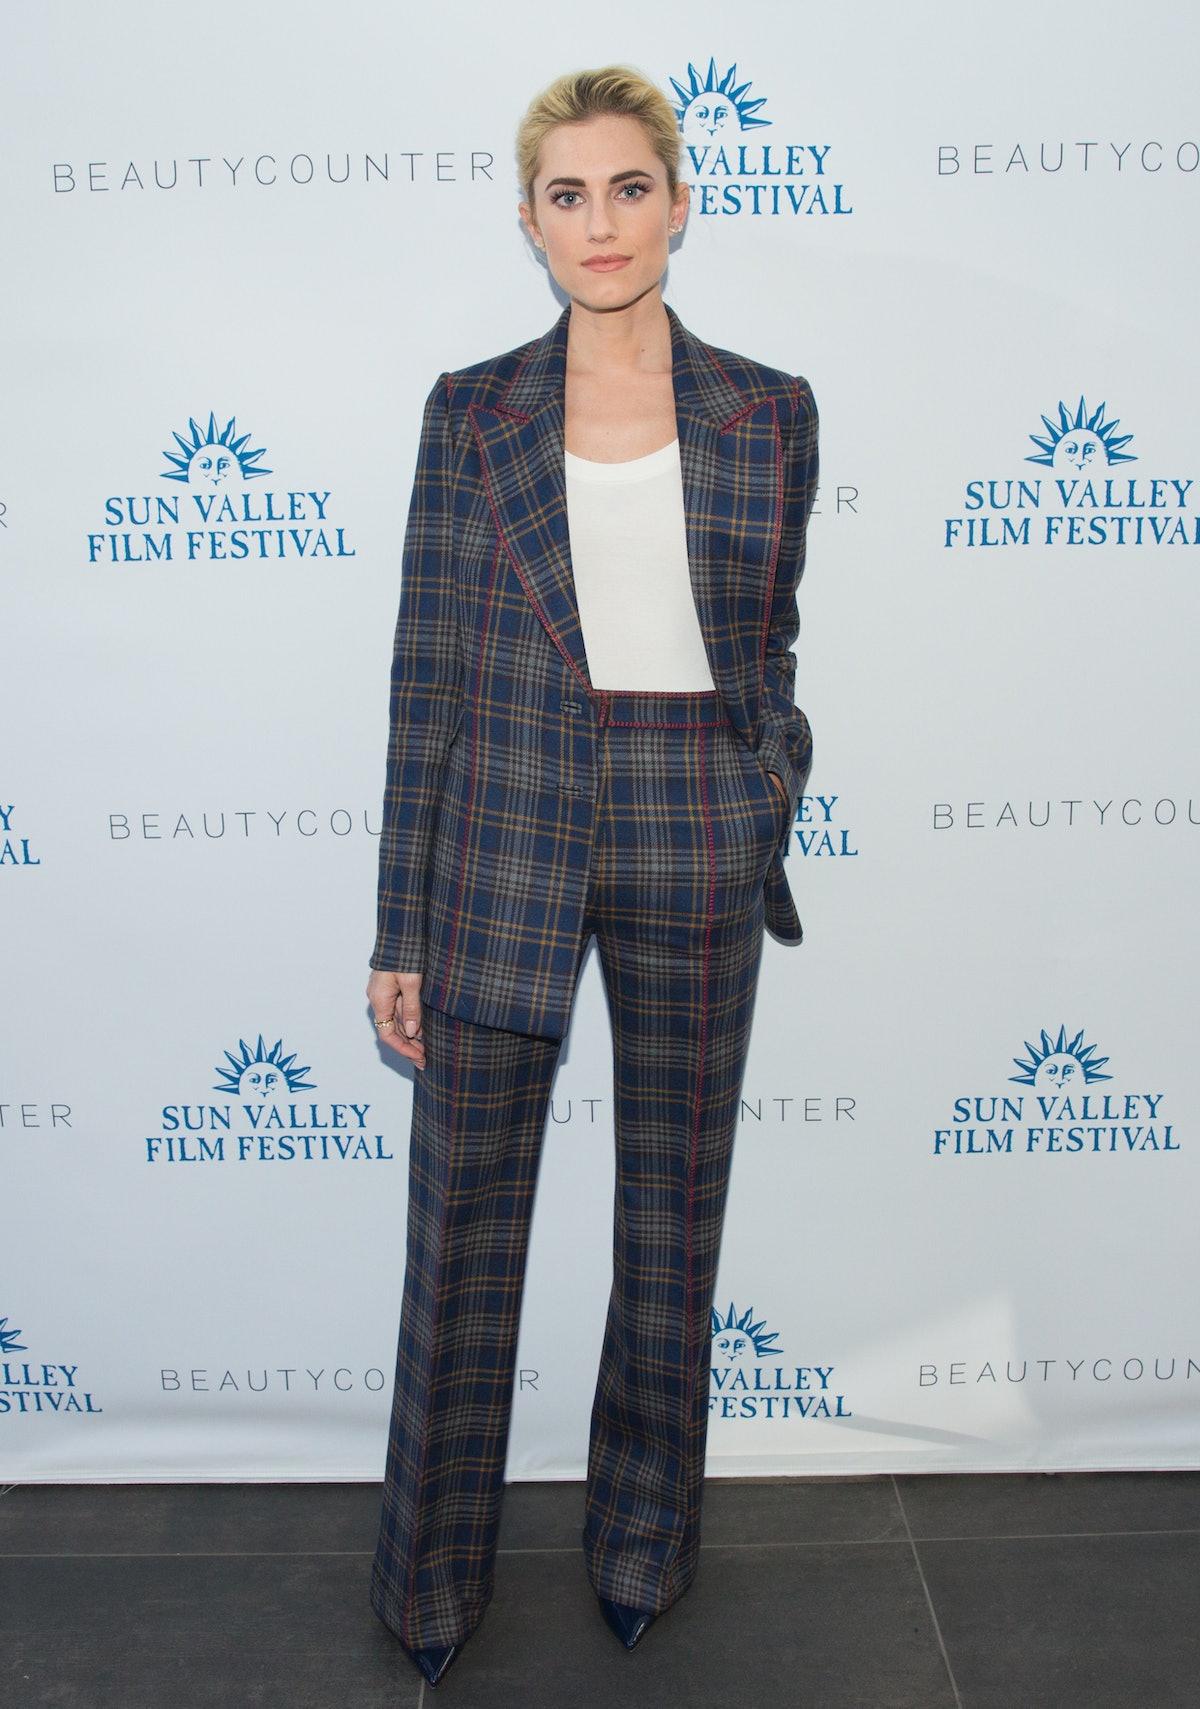 2017 Sun Valley Film Festival - Rising Star Reception to Allison Williams